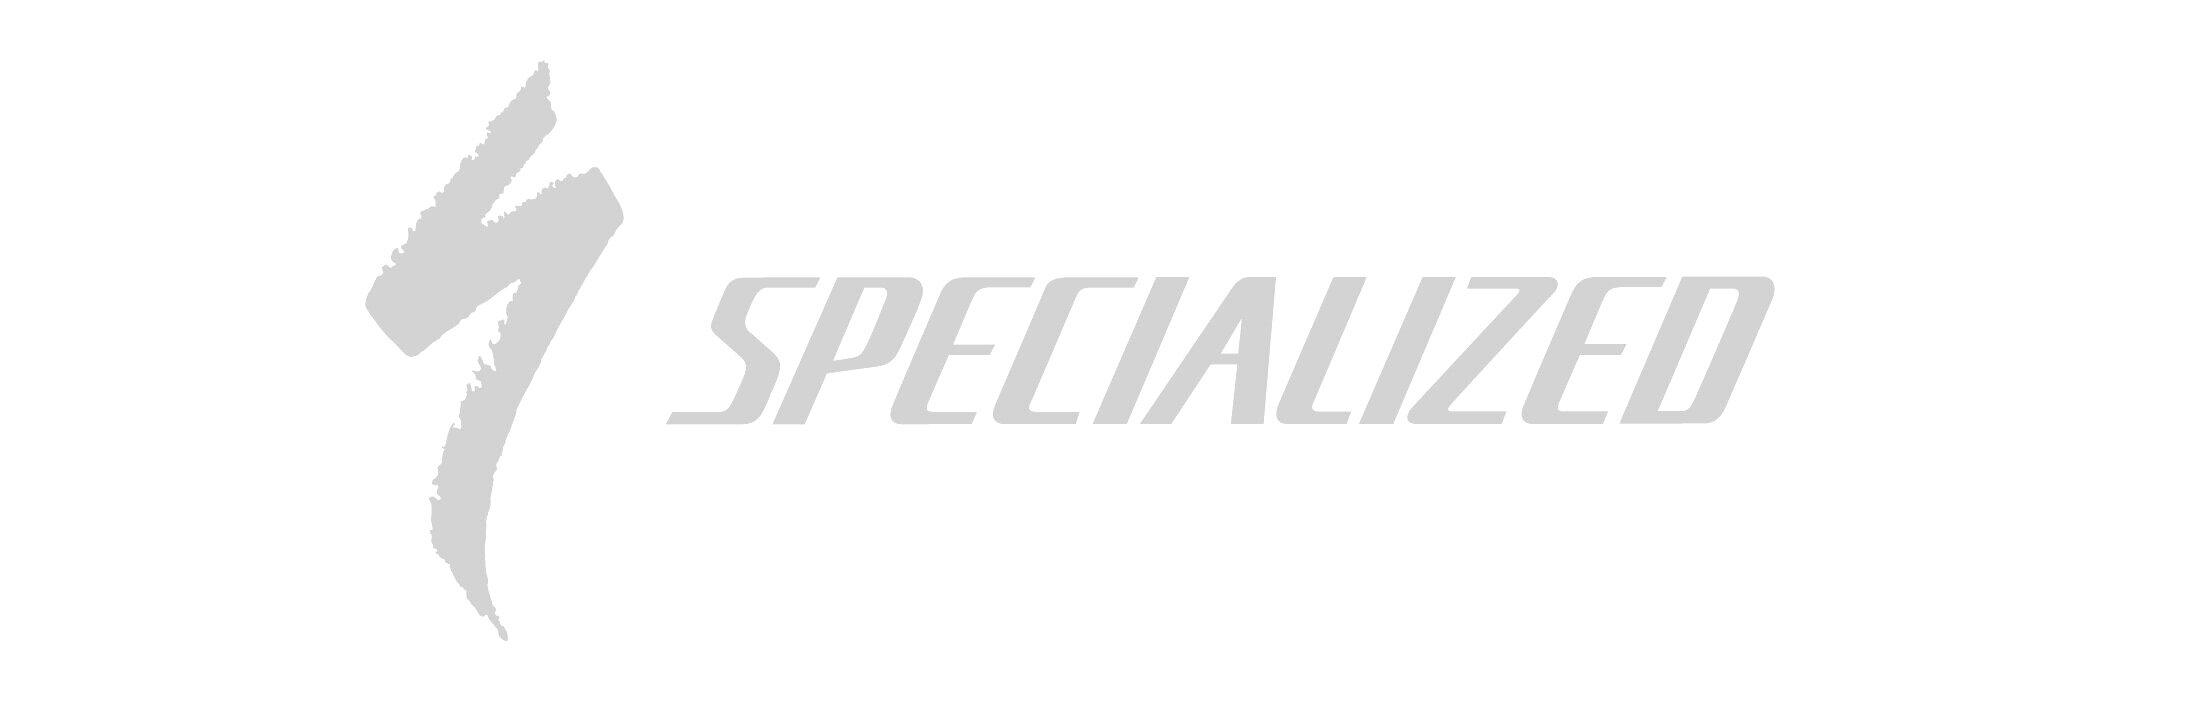 1grey_specialized-logo.png